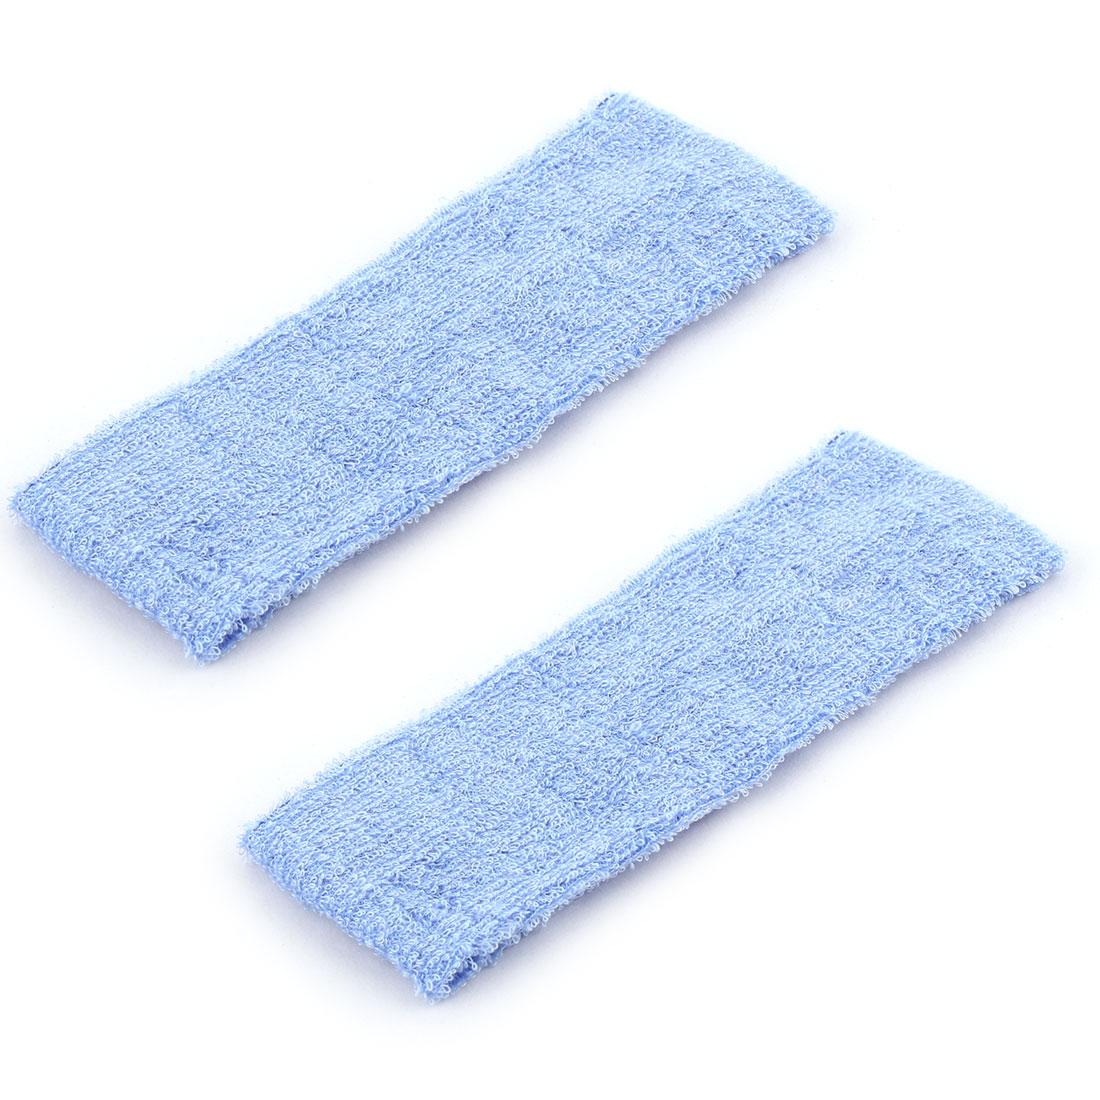 Household Bathroom Exercise Yoga Cotton Washing Headband Hair Band Wrap Light Blue 2pcs